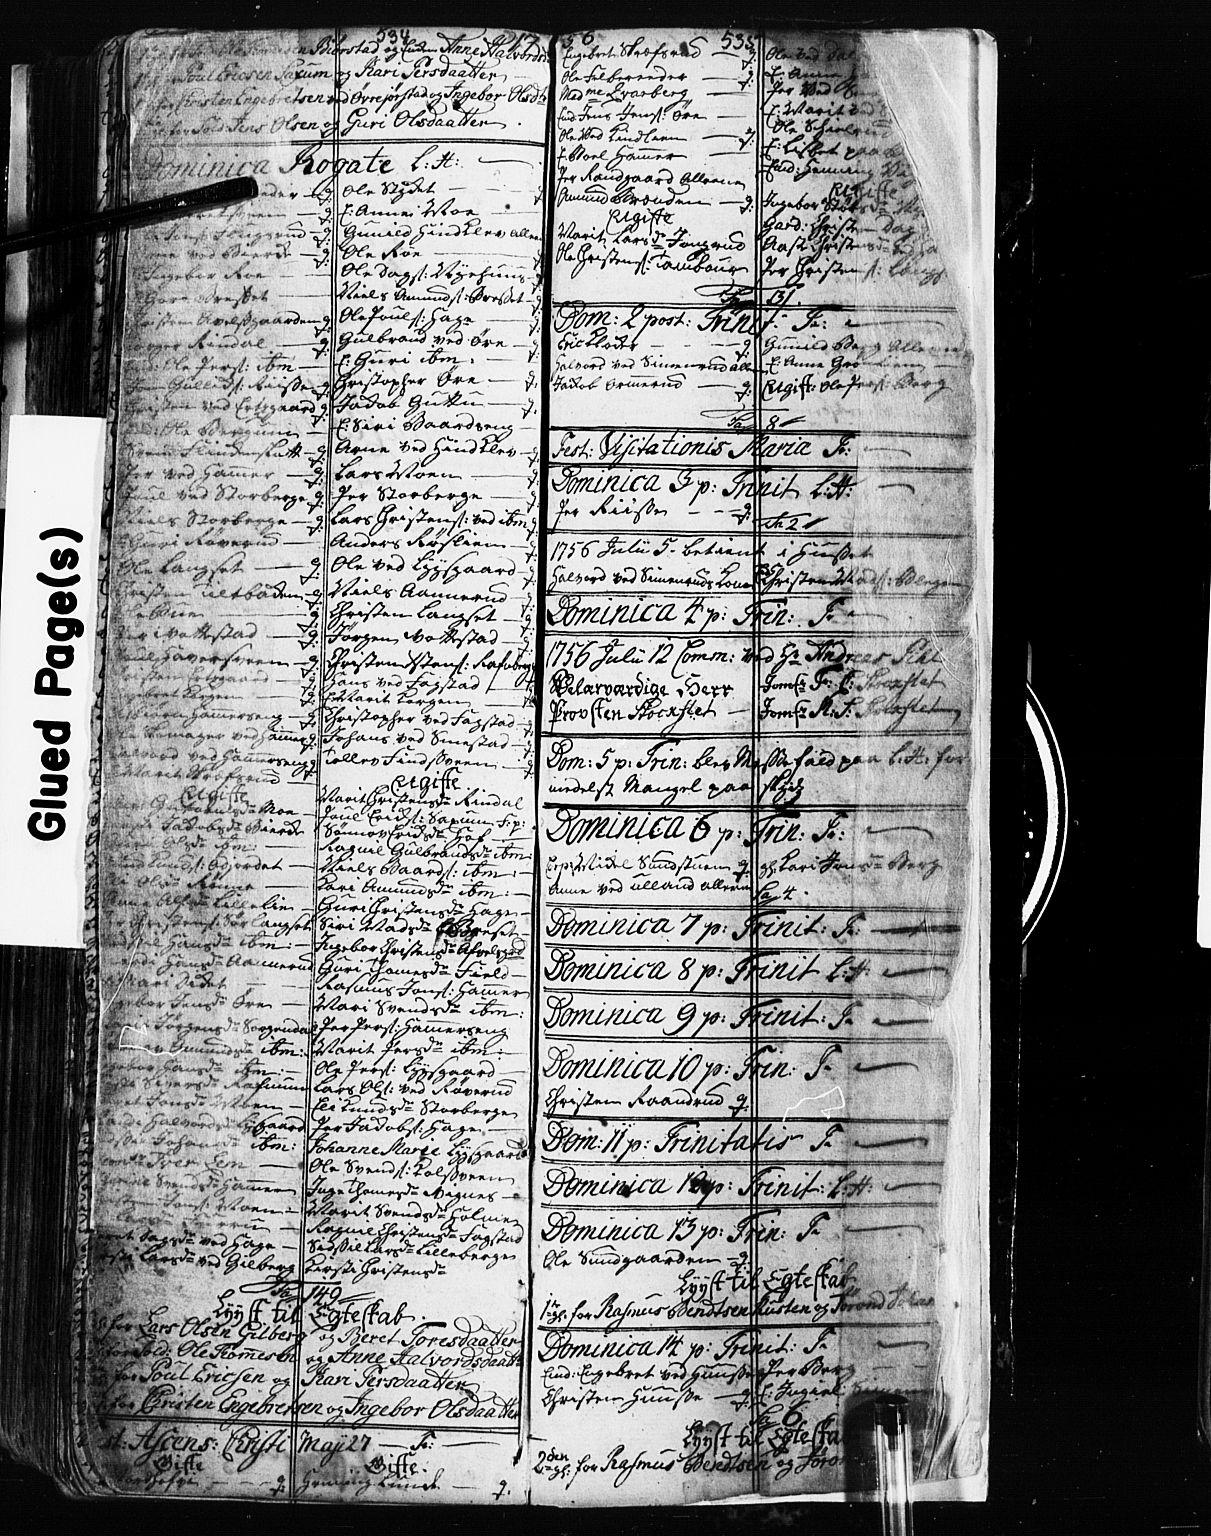 SAH, Fåberg prestekontor, Klokkerbok nr. 2, 1741-1756, s. 534-535